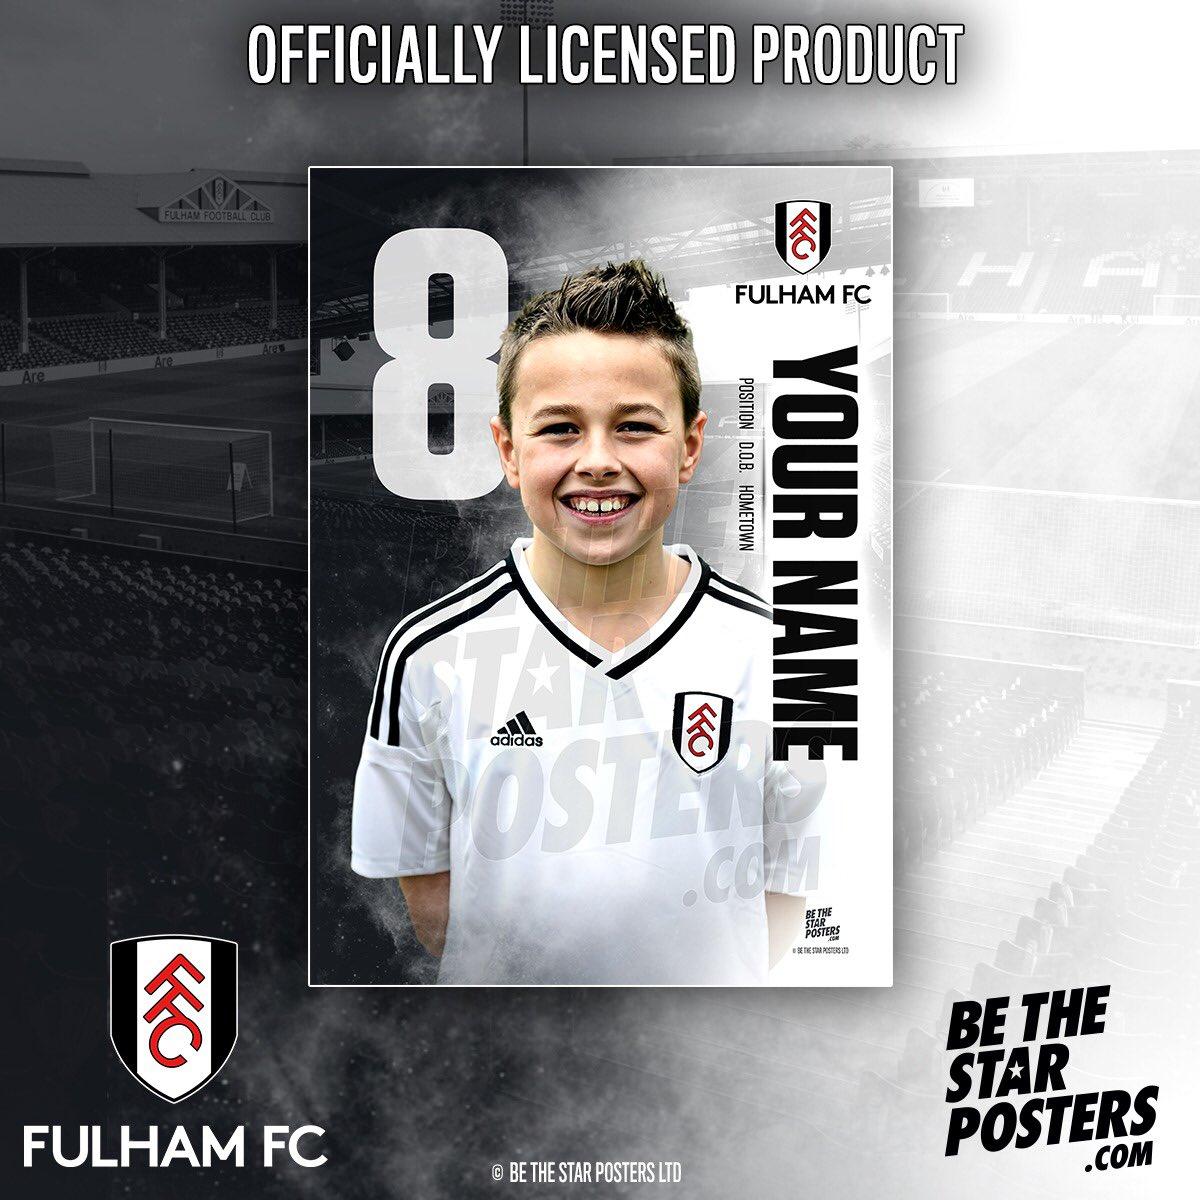 fulhamfootballclub hashtag on Twitter c47a28bee